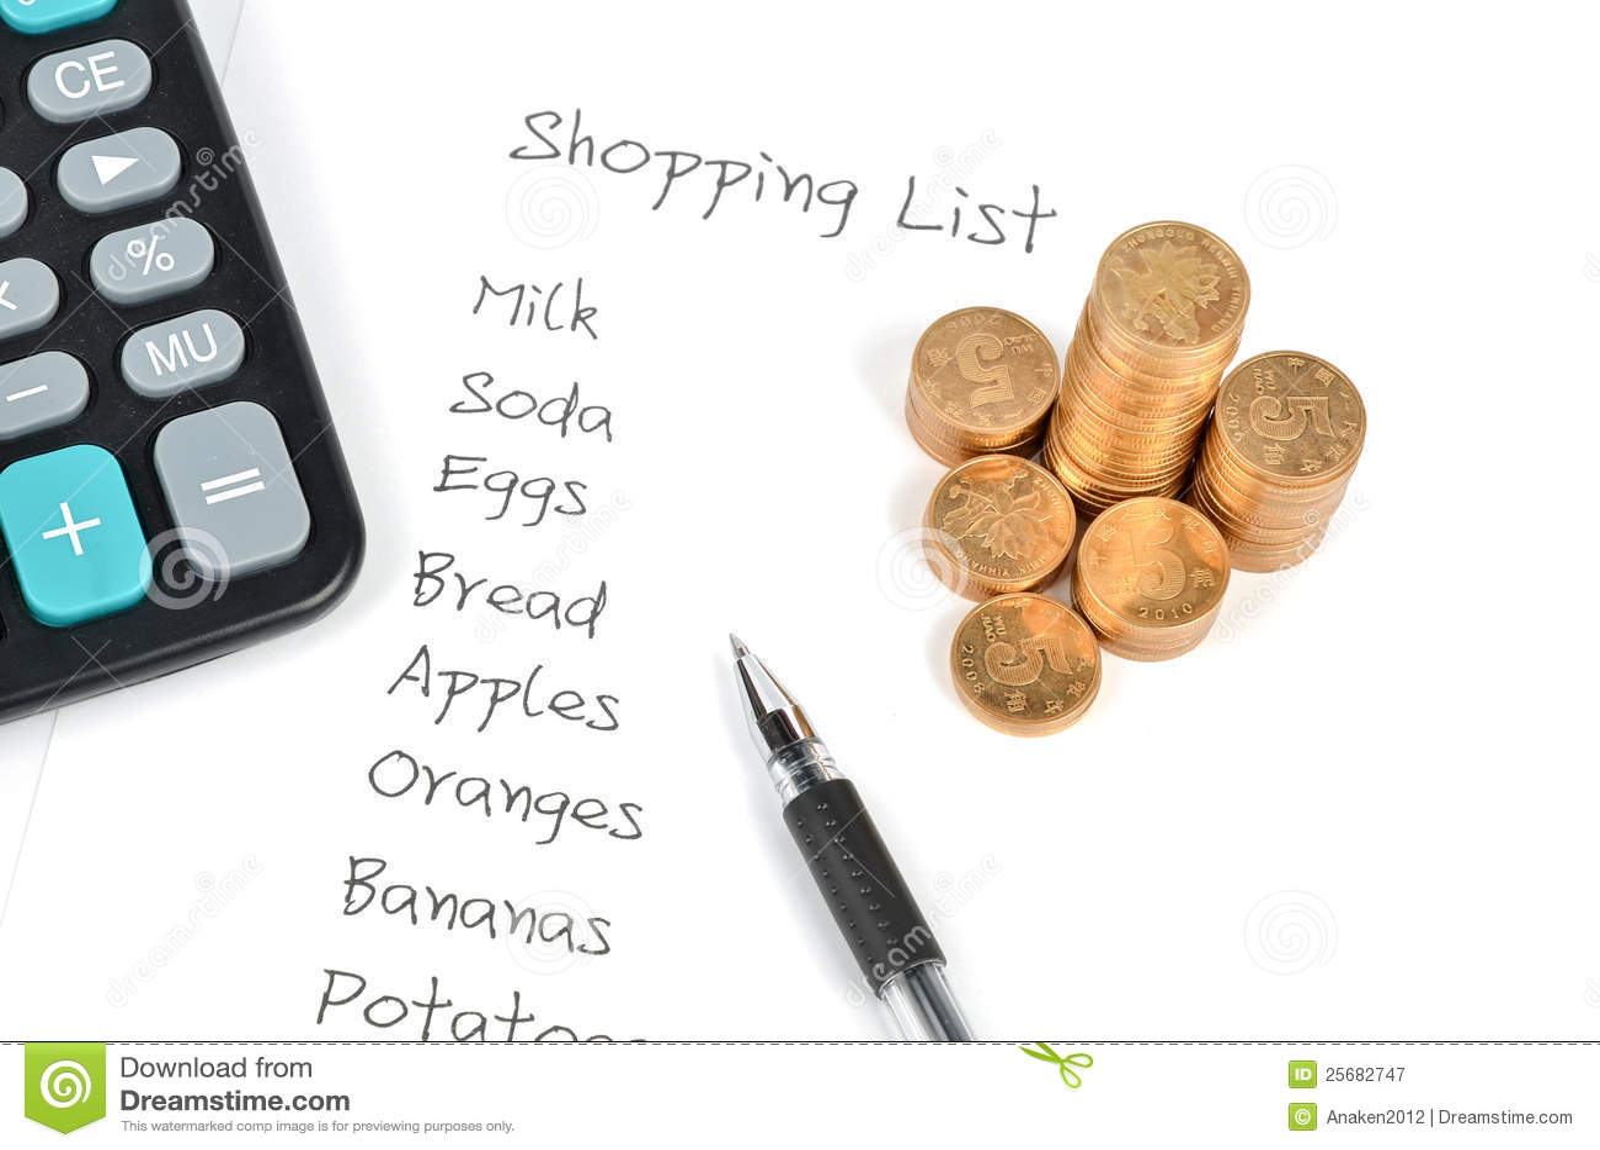 shopping list cost calculator